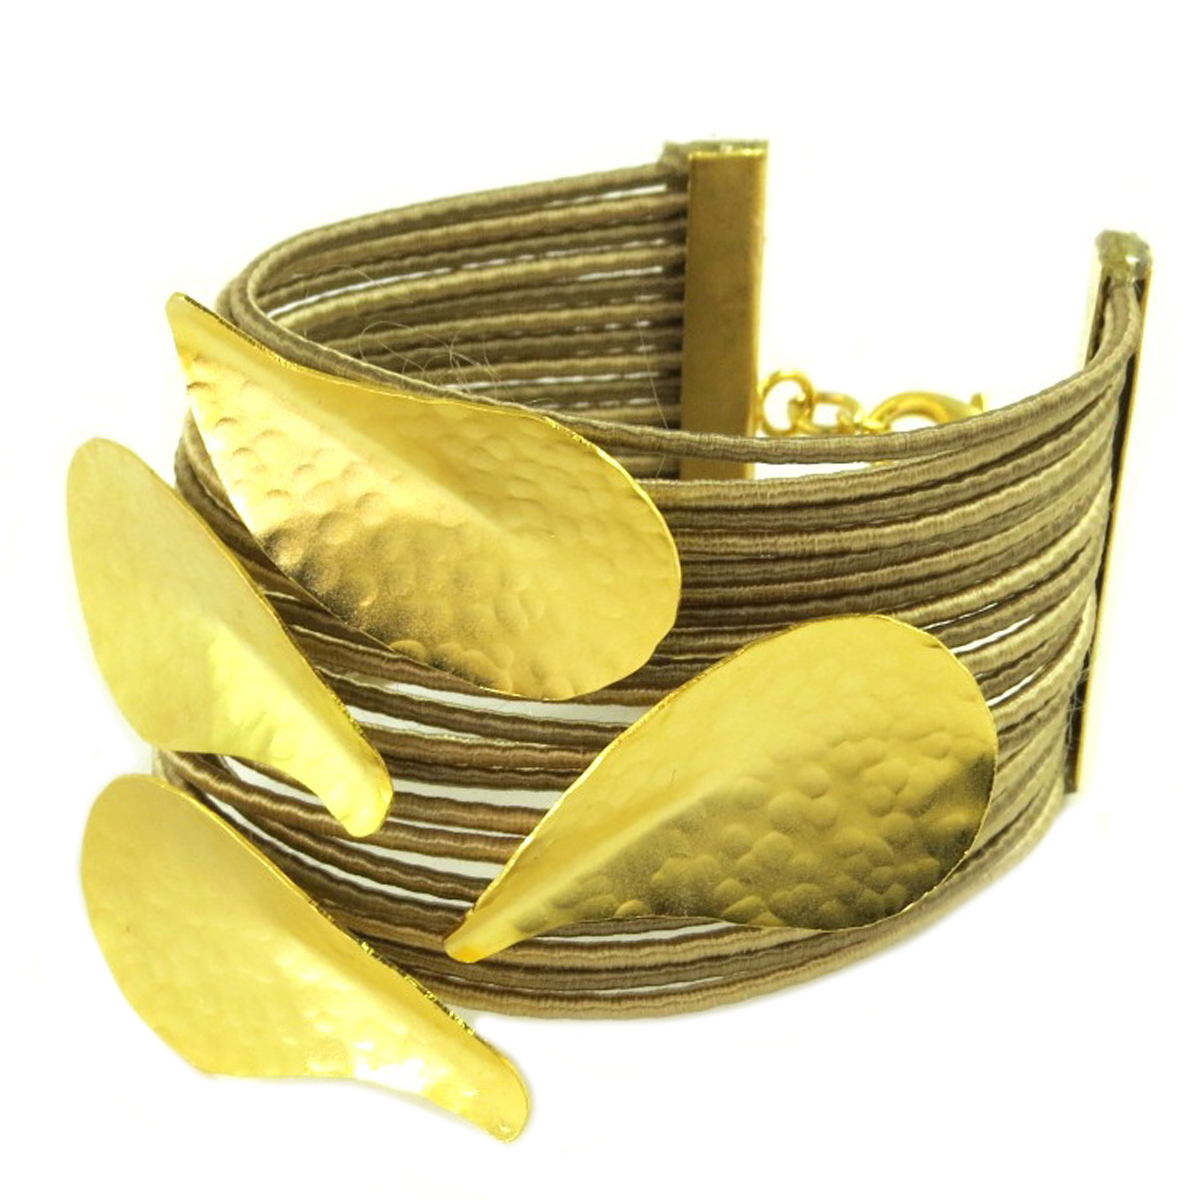 Bracelet artisanal \'Athena\' doré taupe - 70x55 mm - [Q7864]